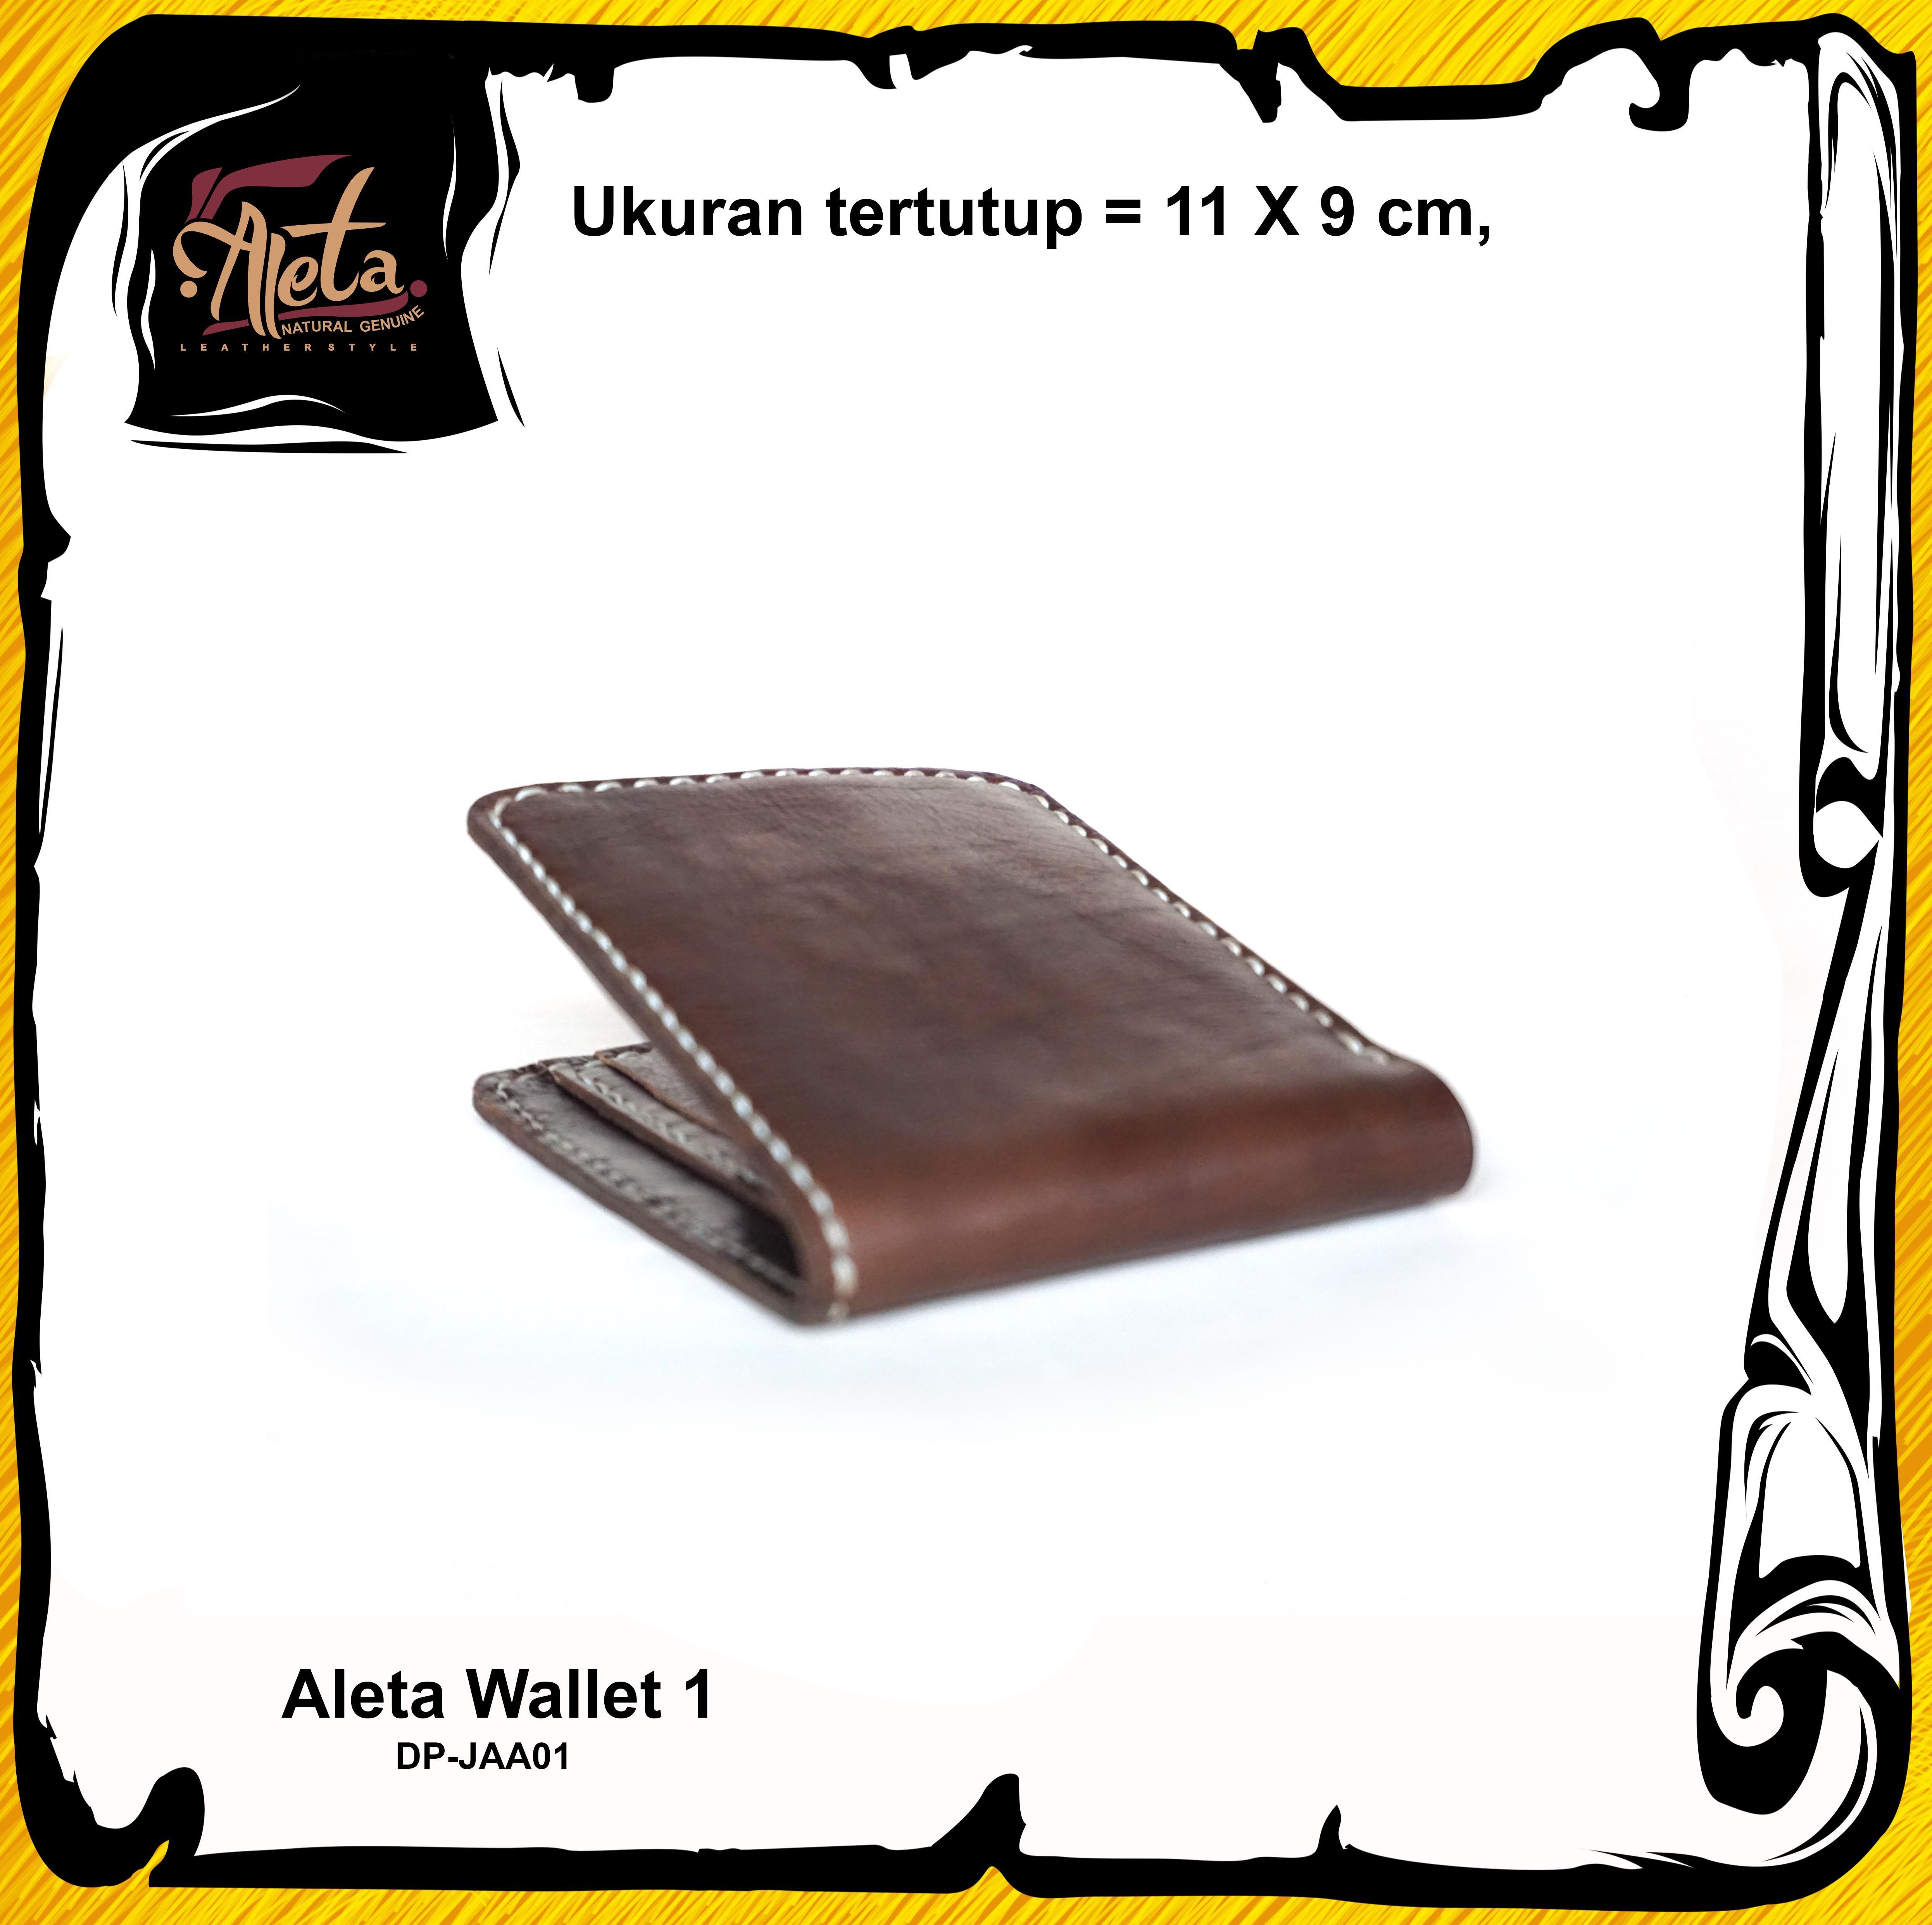 Dompet Kulit Pria Asli 0813 3939 1020 Aleta Natural Genuine Ular Phyton Warna Model Bifold Leather Style